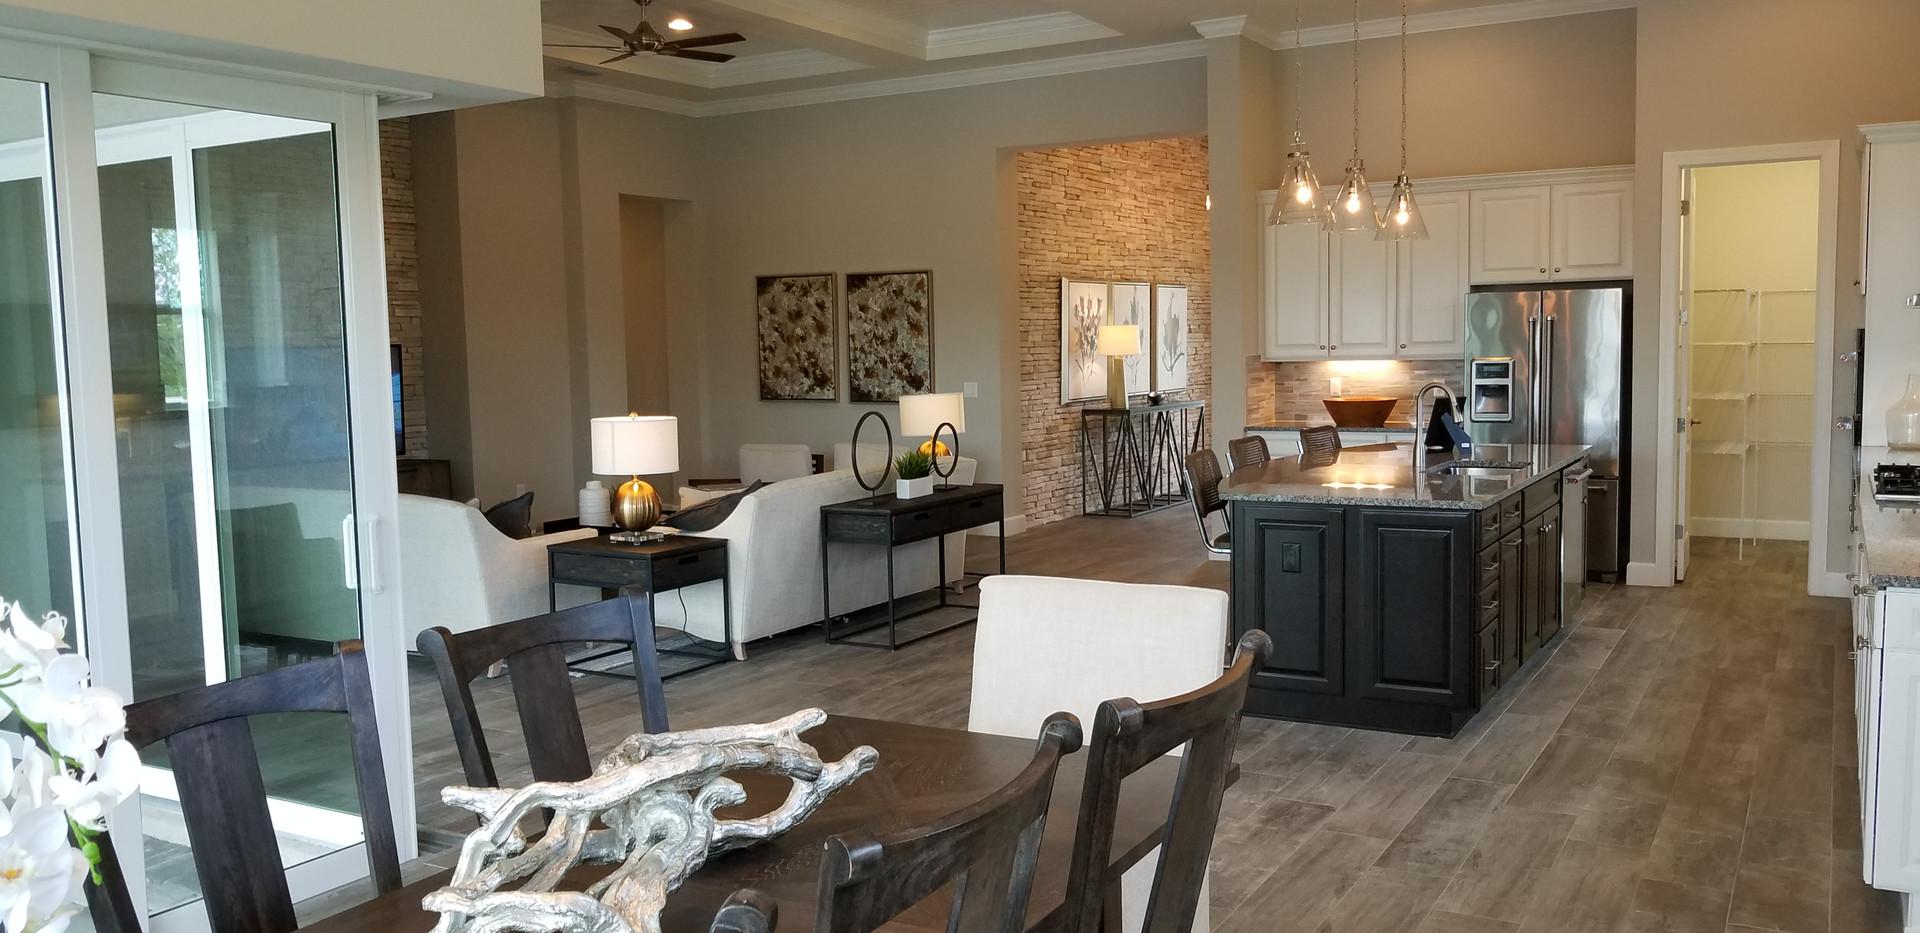 20180627_Mallory Park Lakewood Ranch model home122826.jpg